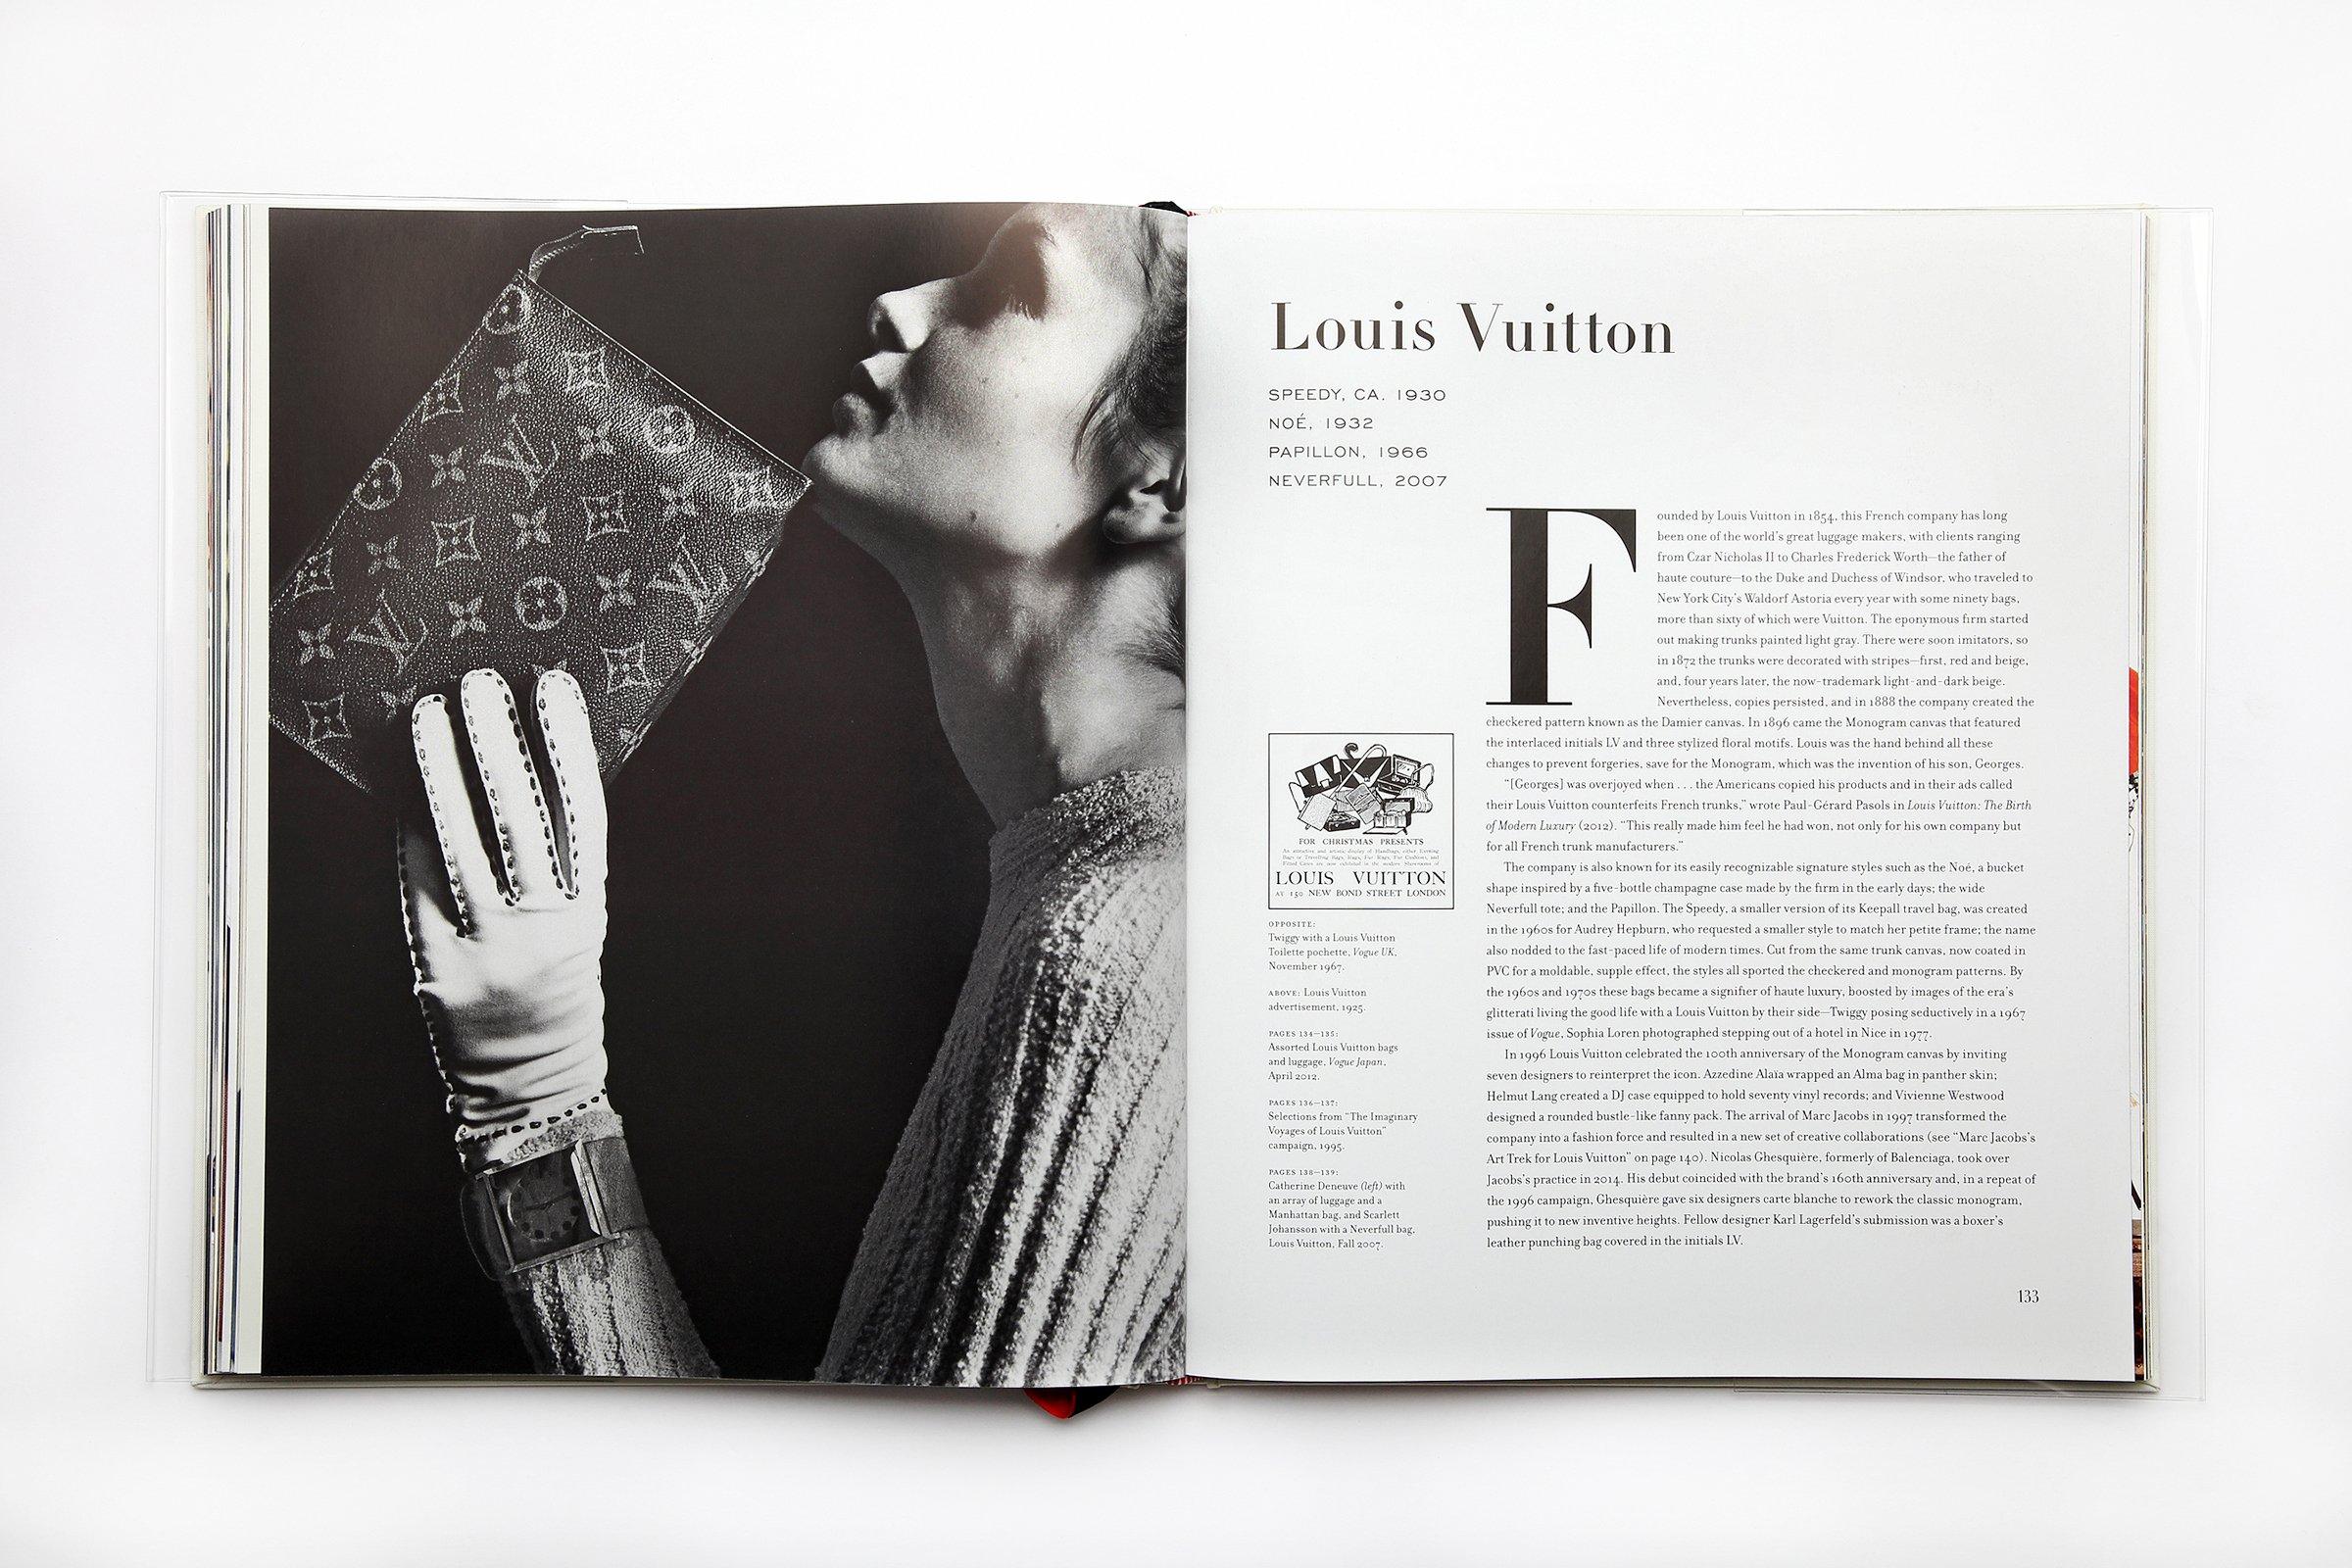 e450b7eabd4f Handbags  A Love Story  Legendary Designs from Azzedine Alaïa to Yves Saint  Laurent  Amazon.co.uk  Monica Botkier  9780062428356  Books